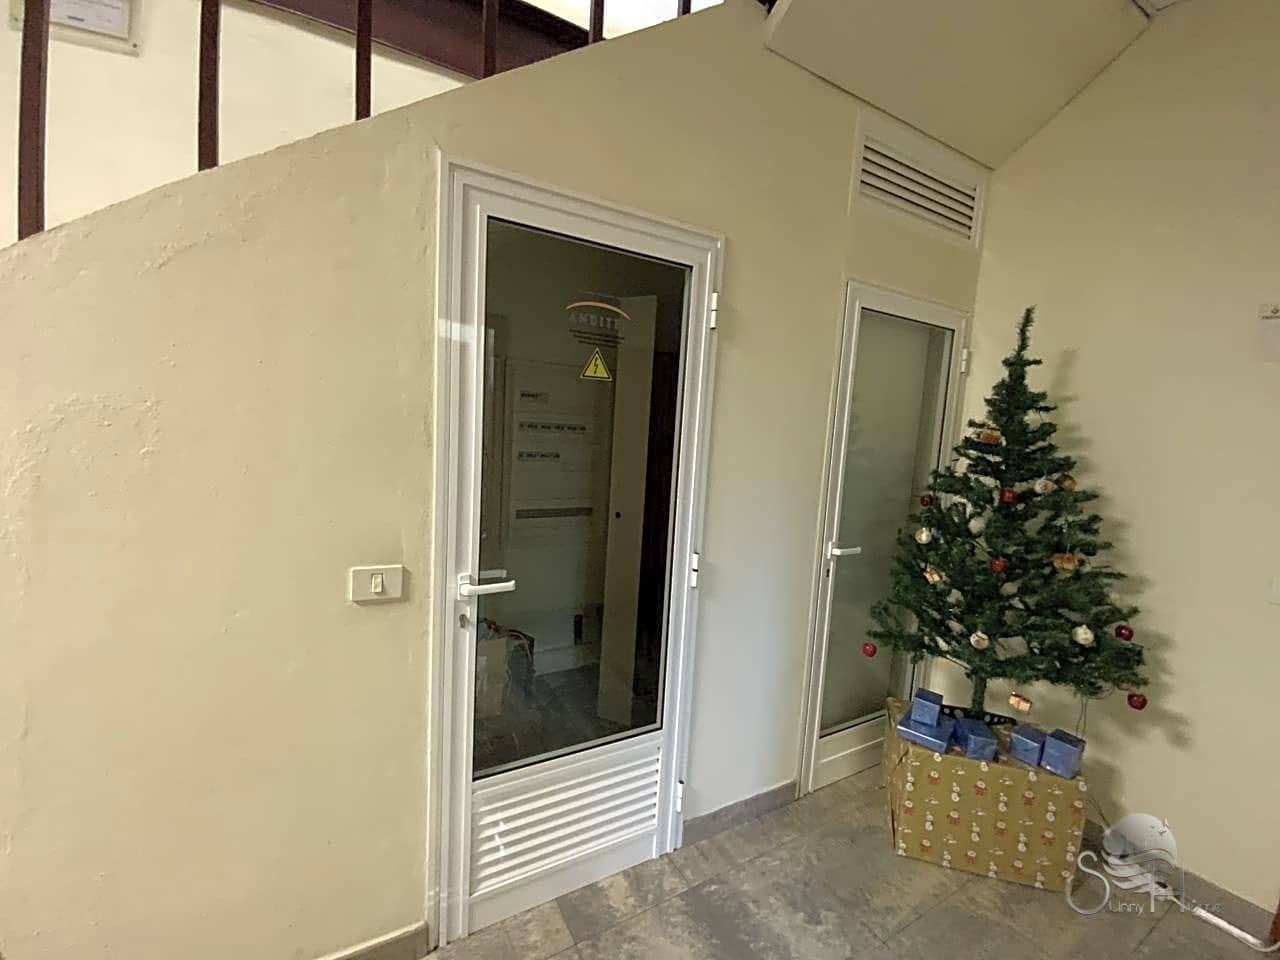 5 chambre Local Commercial à vendre à Santa Cruz de Tenerife - 462 000 € (Ref: 5943311)